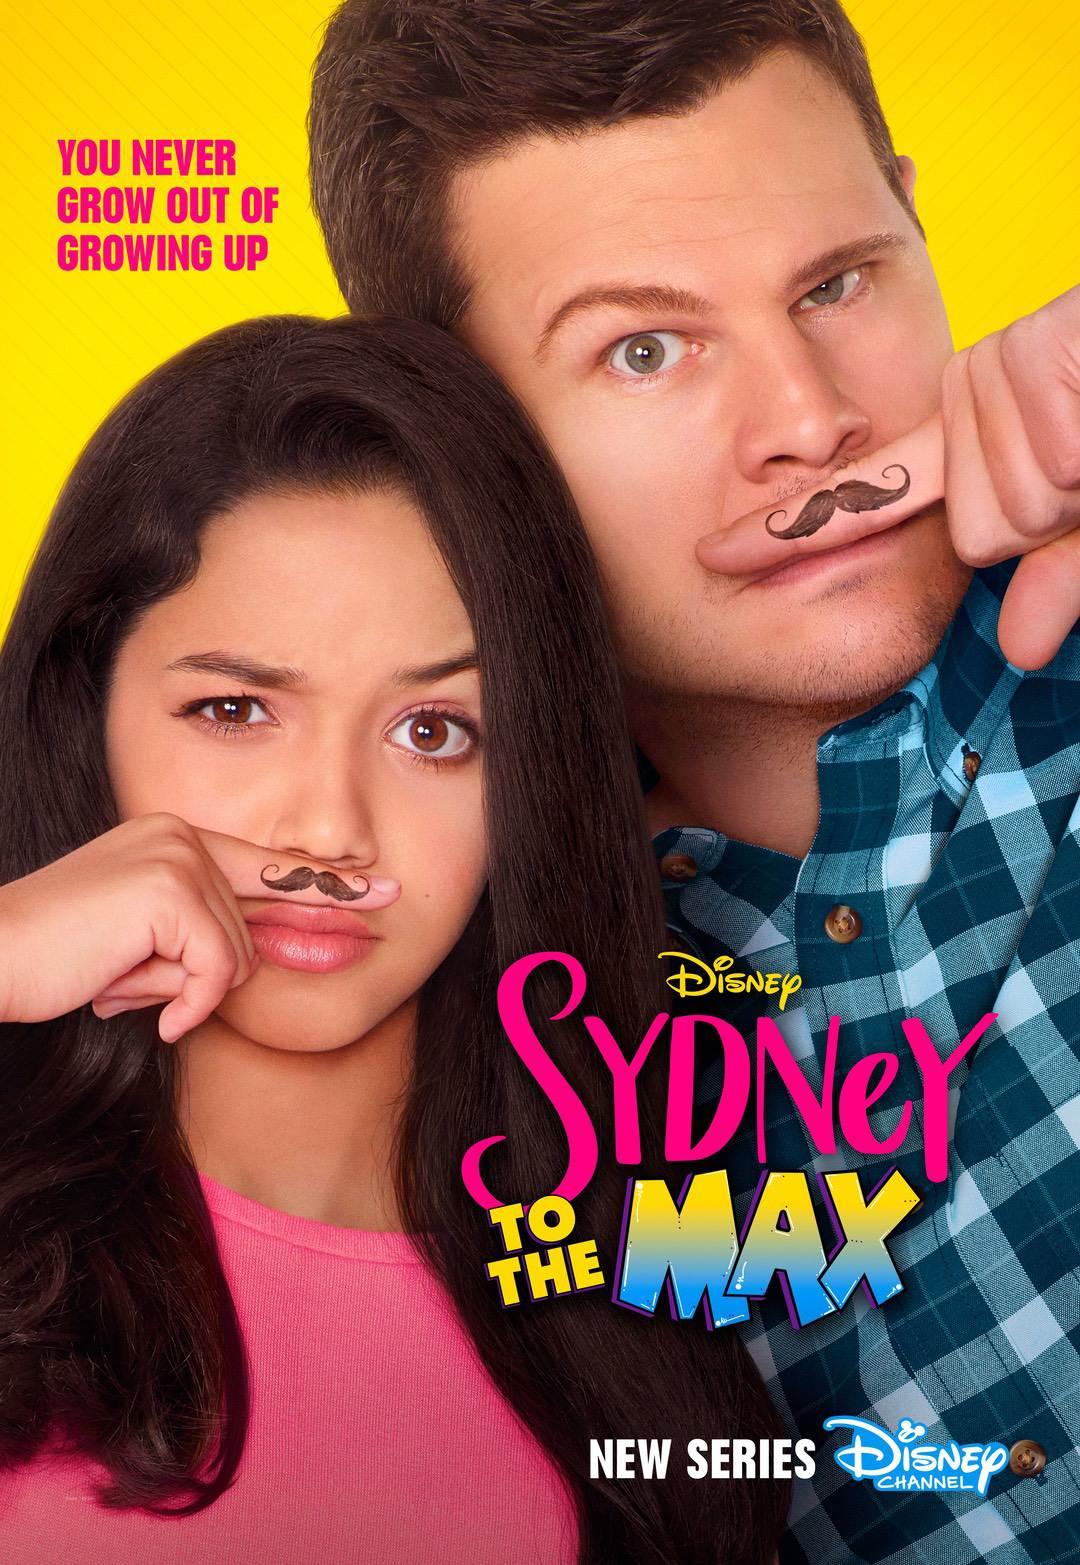 Sydney to the Max #SydneyToTheMax #Disney #ad